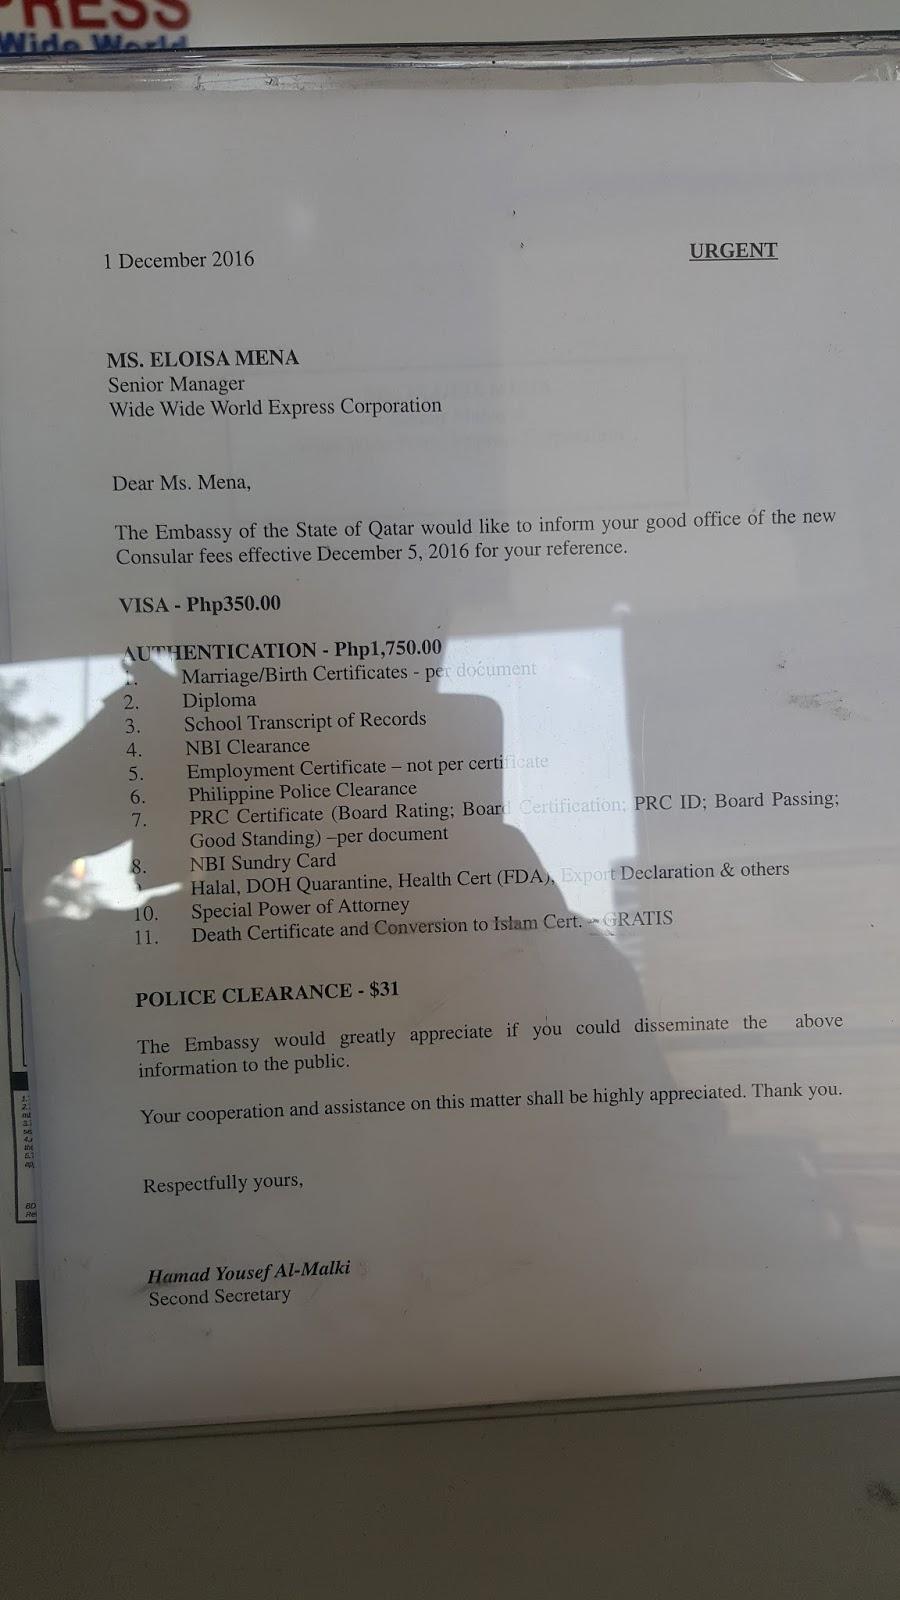 Qatar Embassy Attestation Of Documents